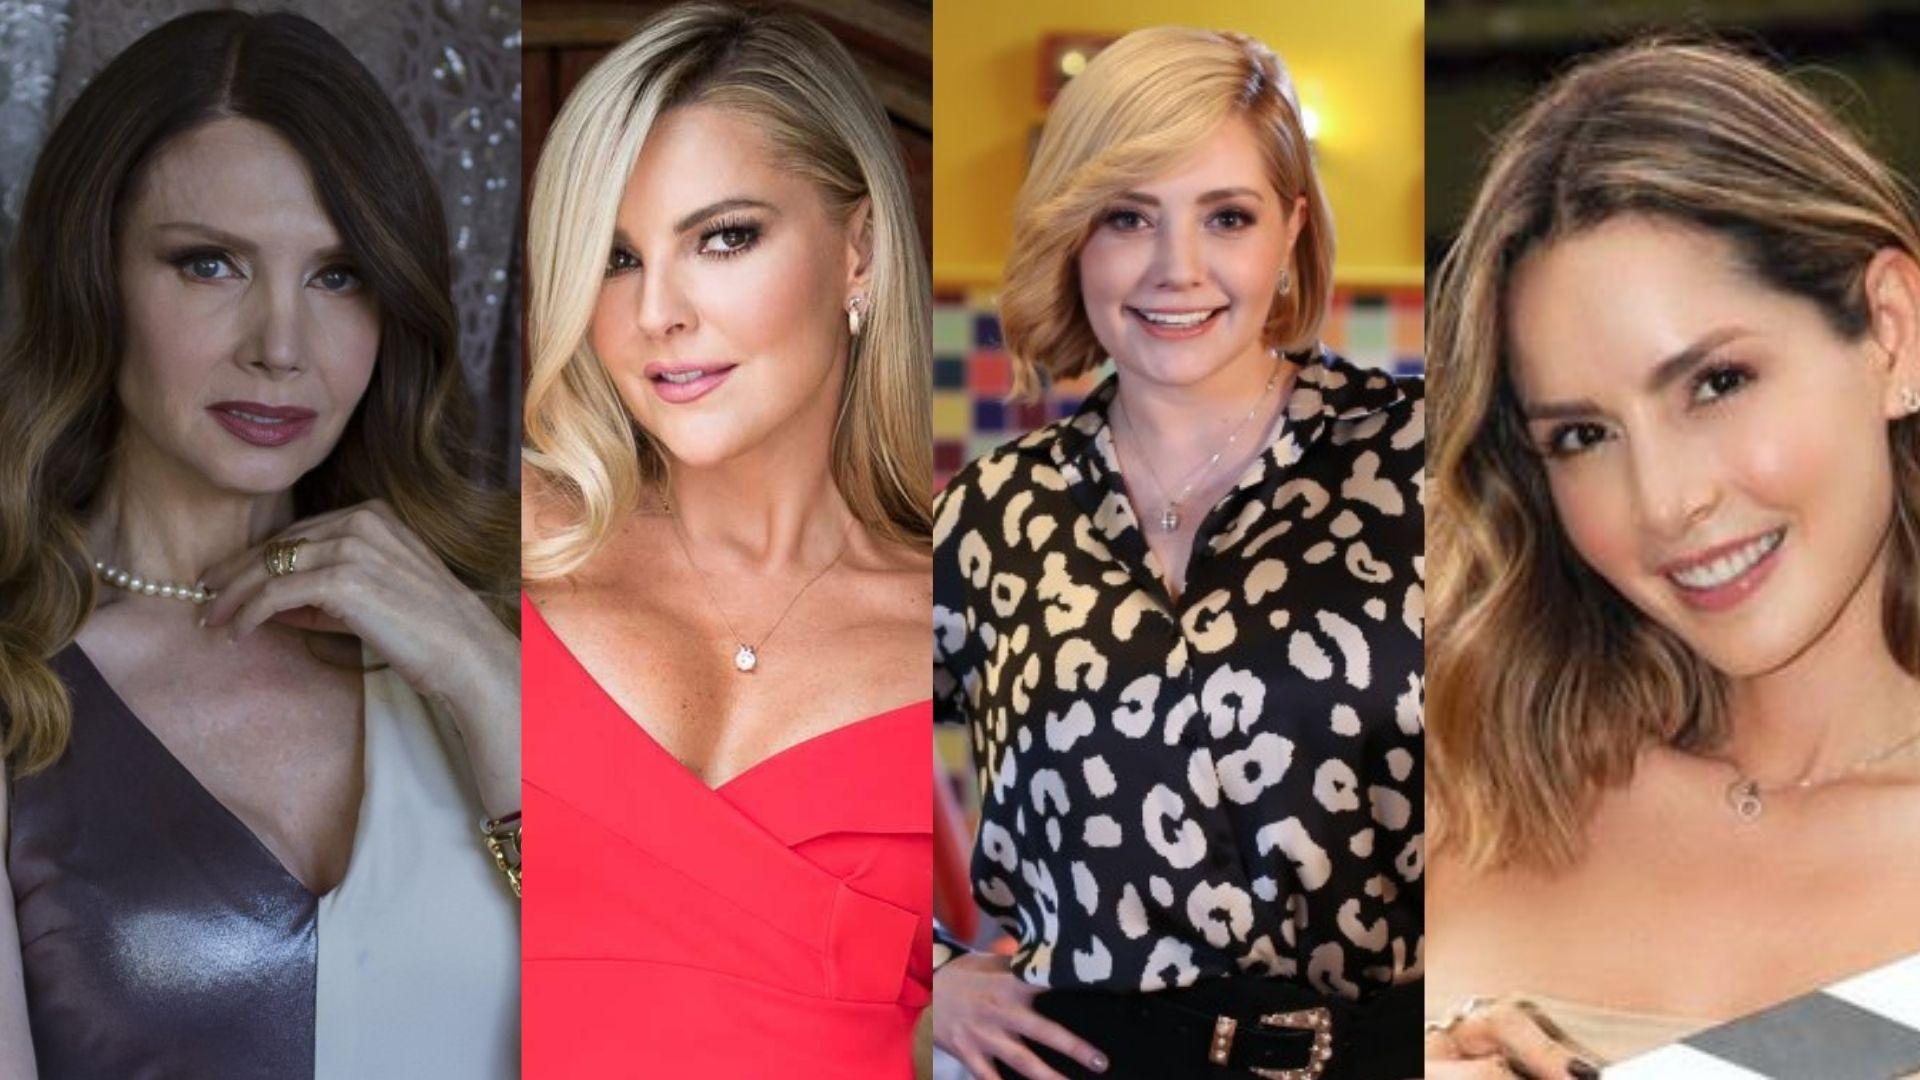 Mejor villana de telenovelas actuales   ¿Marjourie de Sousa, Carmen Villalobos, Francés Ondiviela o Lisette Morelos?   Vota por tu favorita